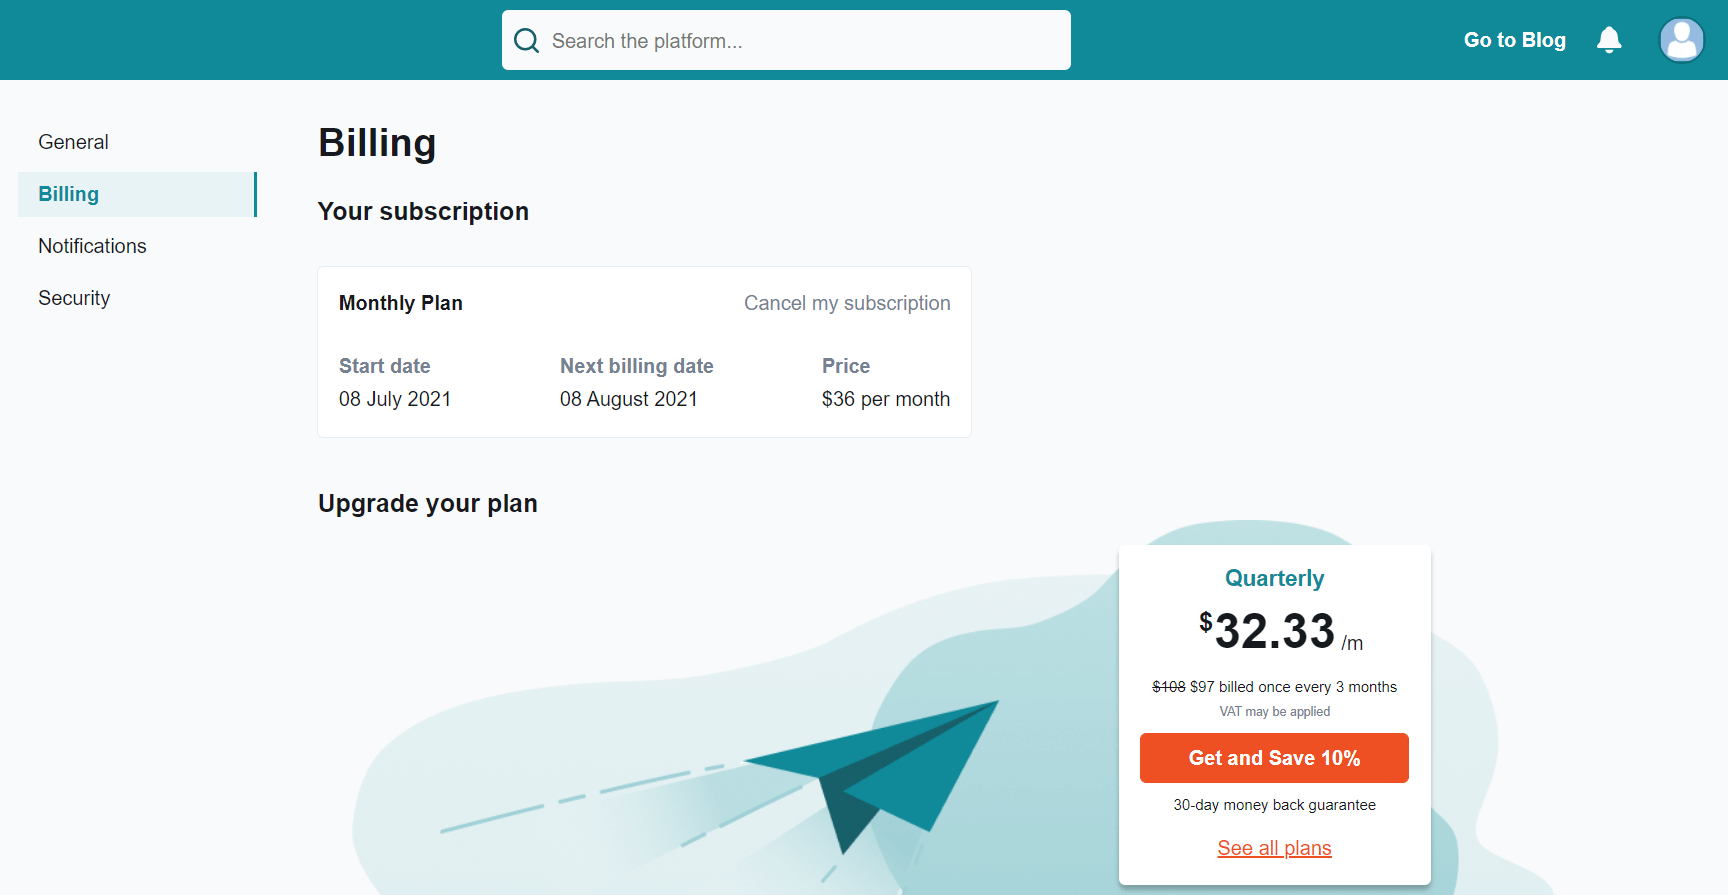 Your subscription screenshot